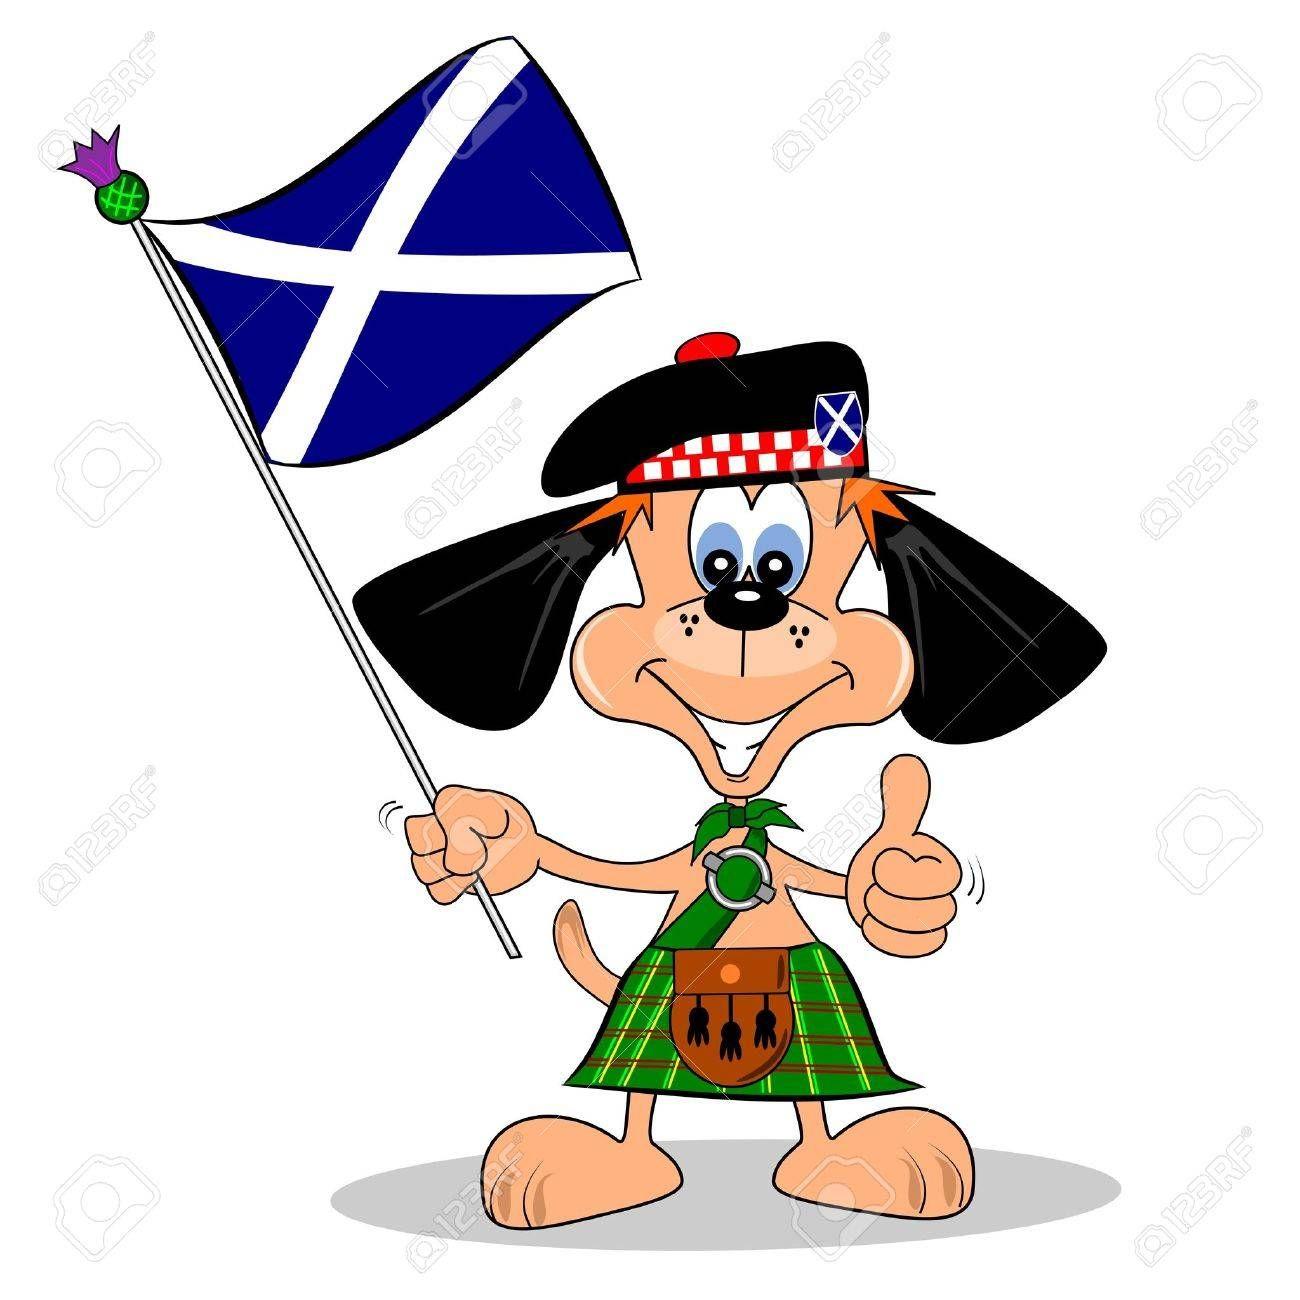 kilt Scottishkilts kiltlovers kilts kiltformen